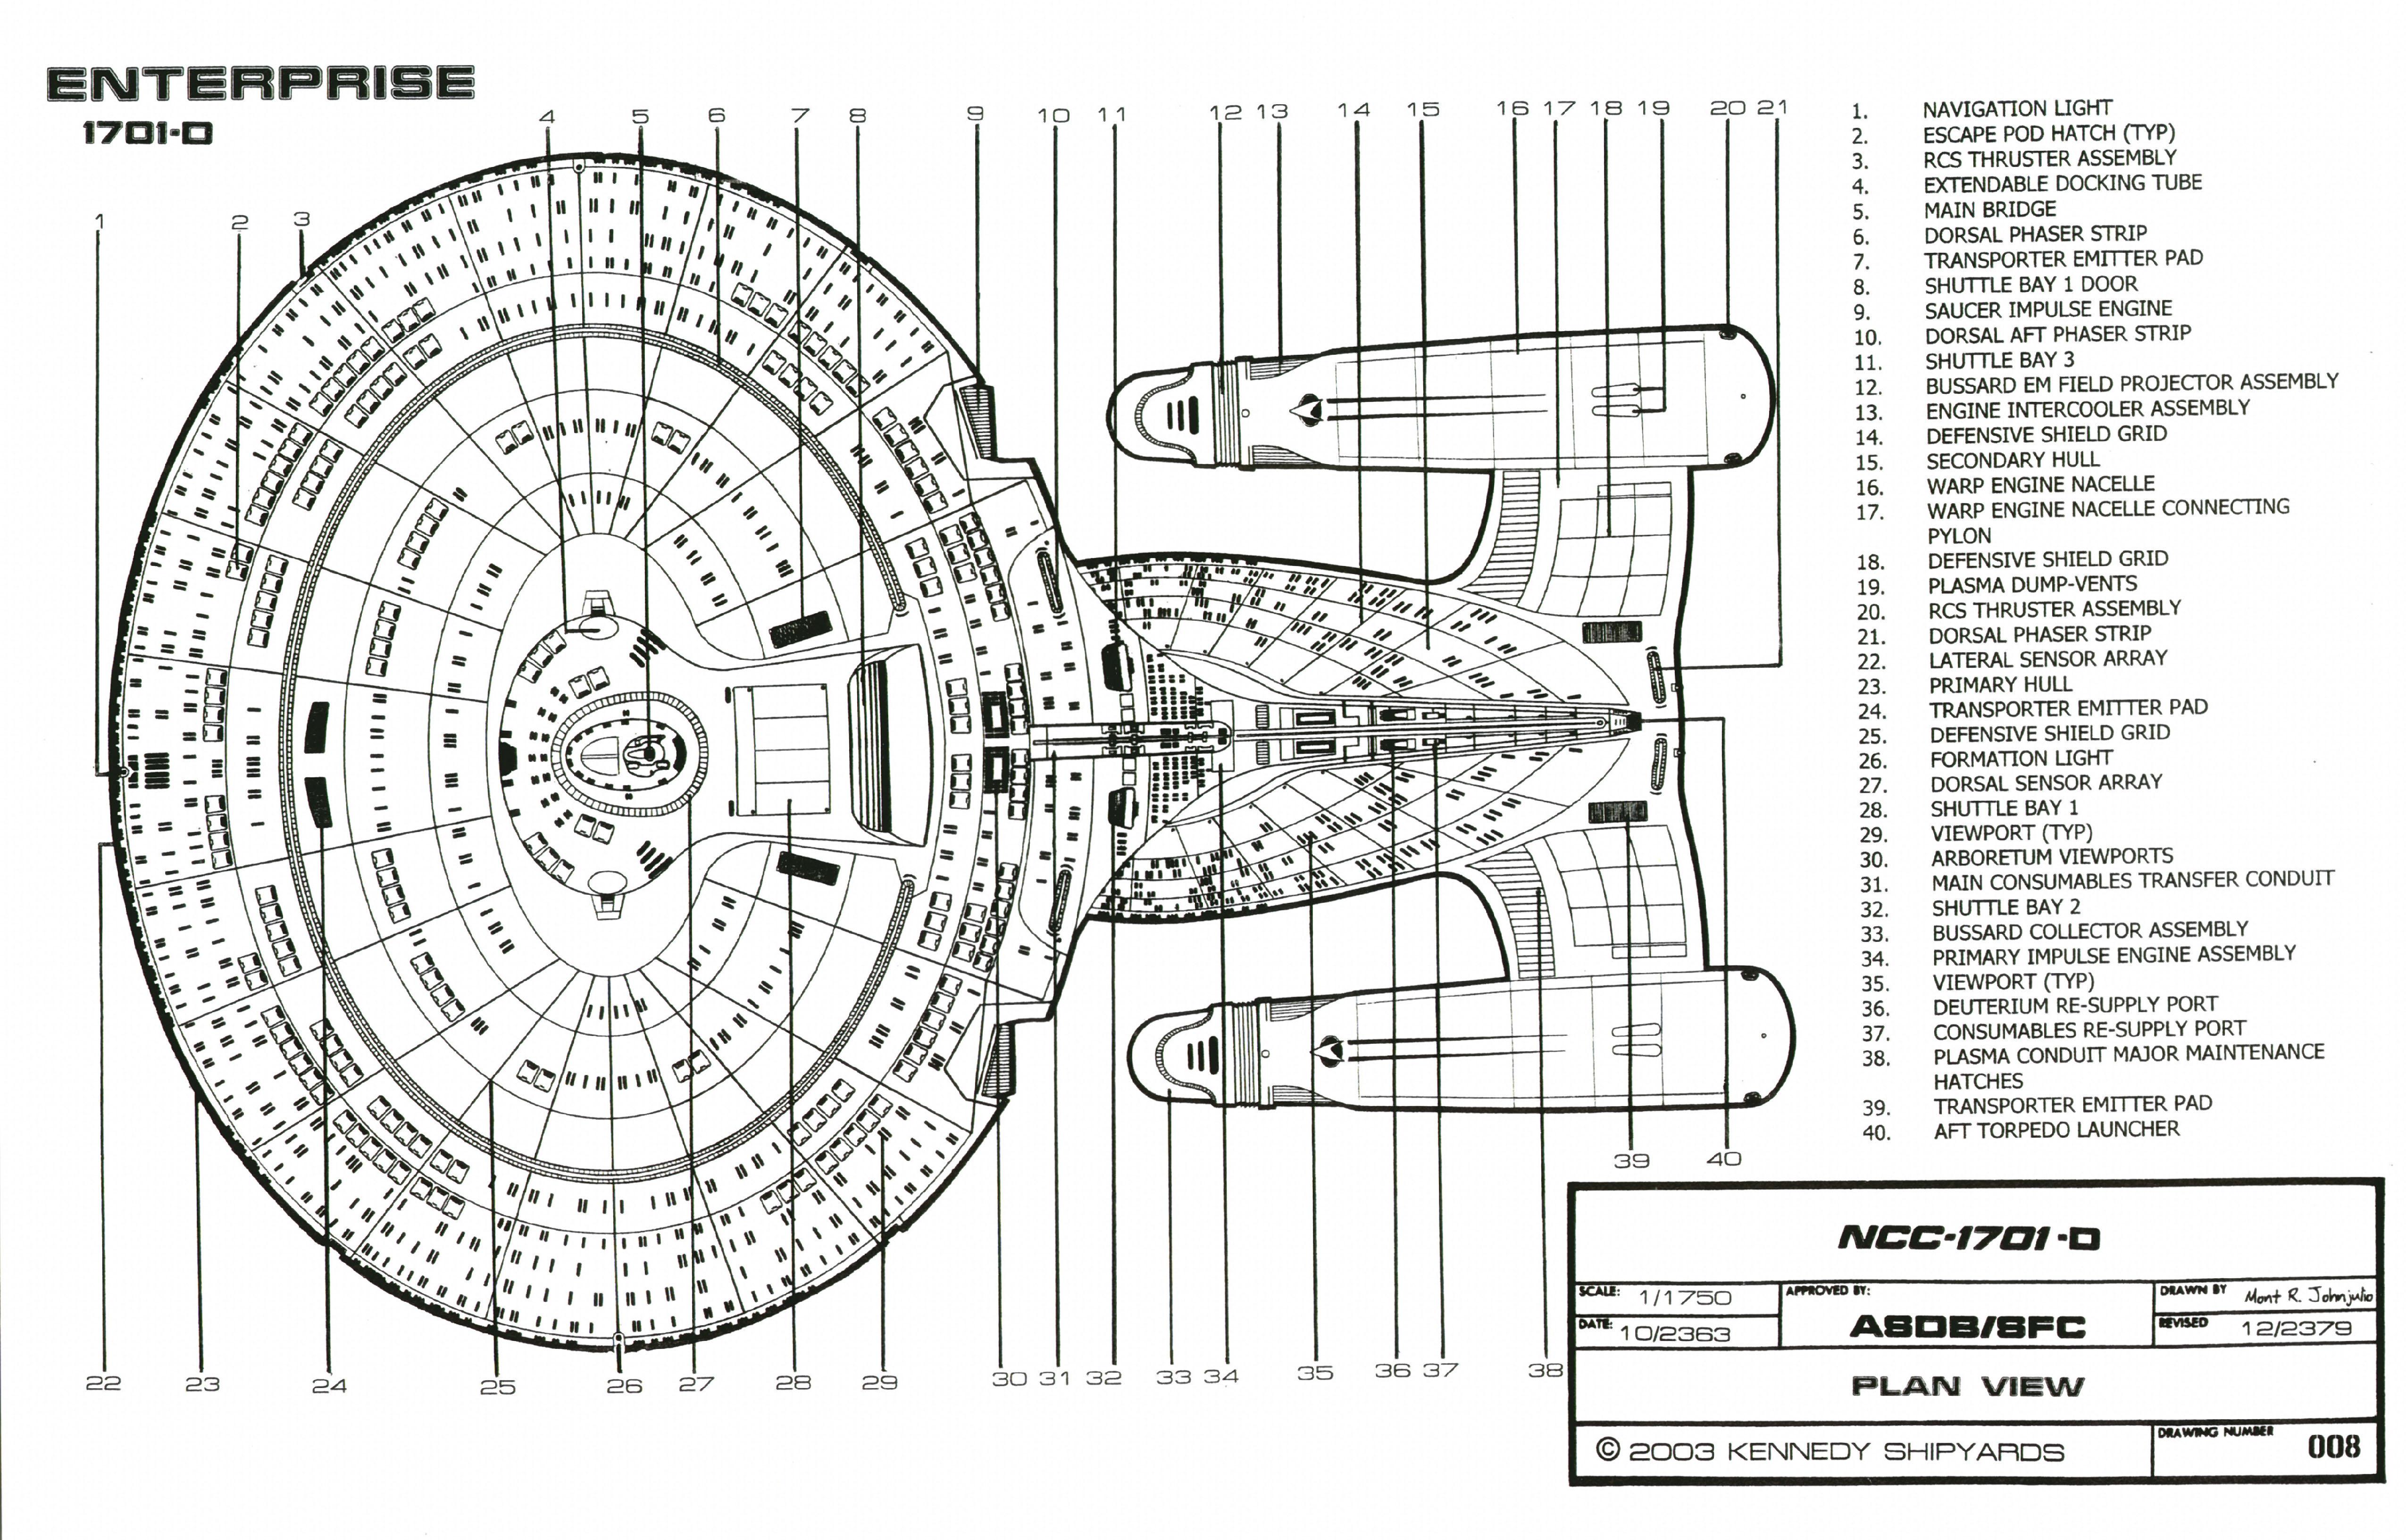 Star Trek Blueprints: Starfleet Vessel: Galaxy Cl Starship ...